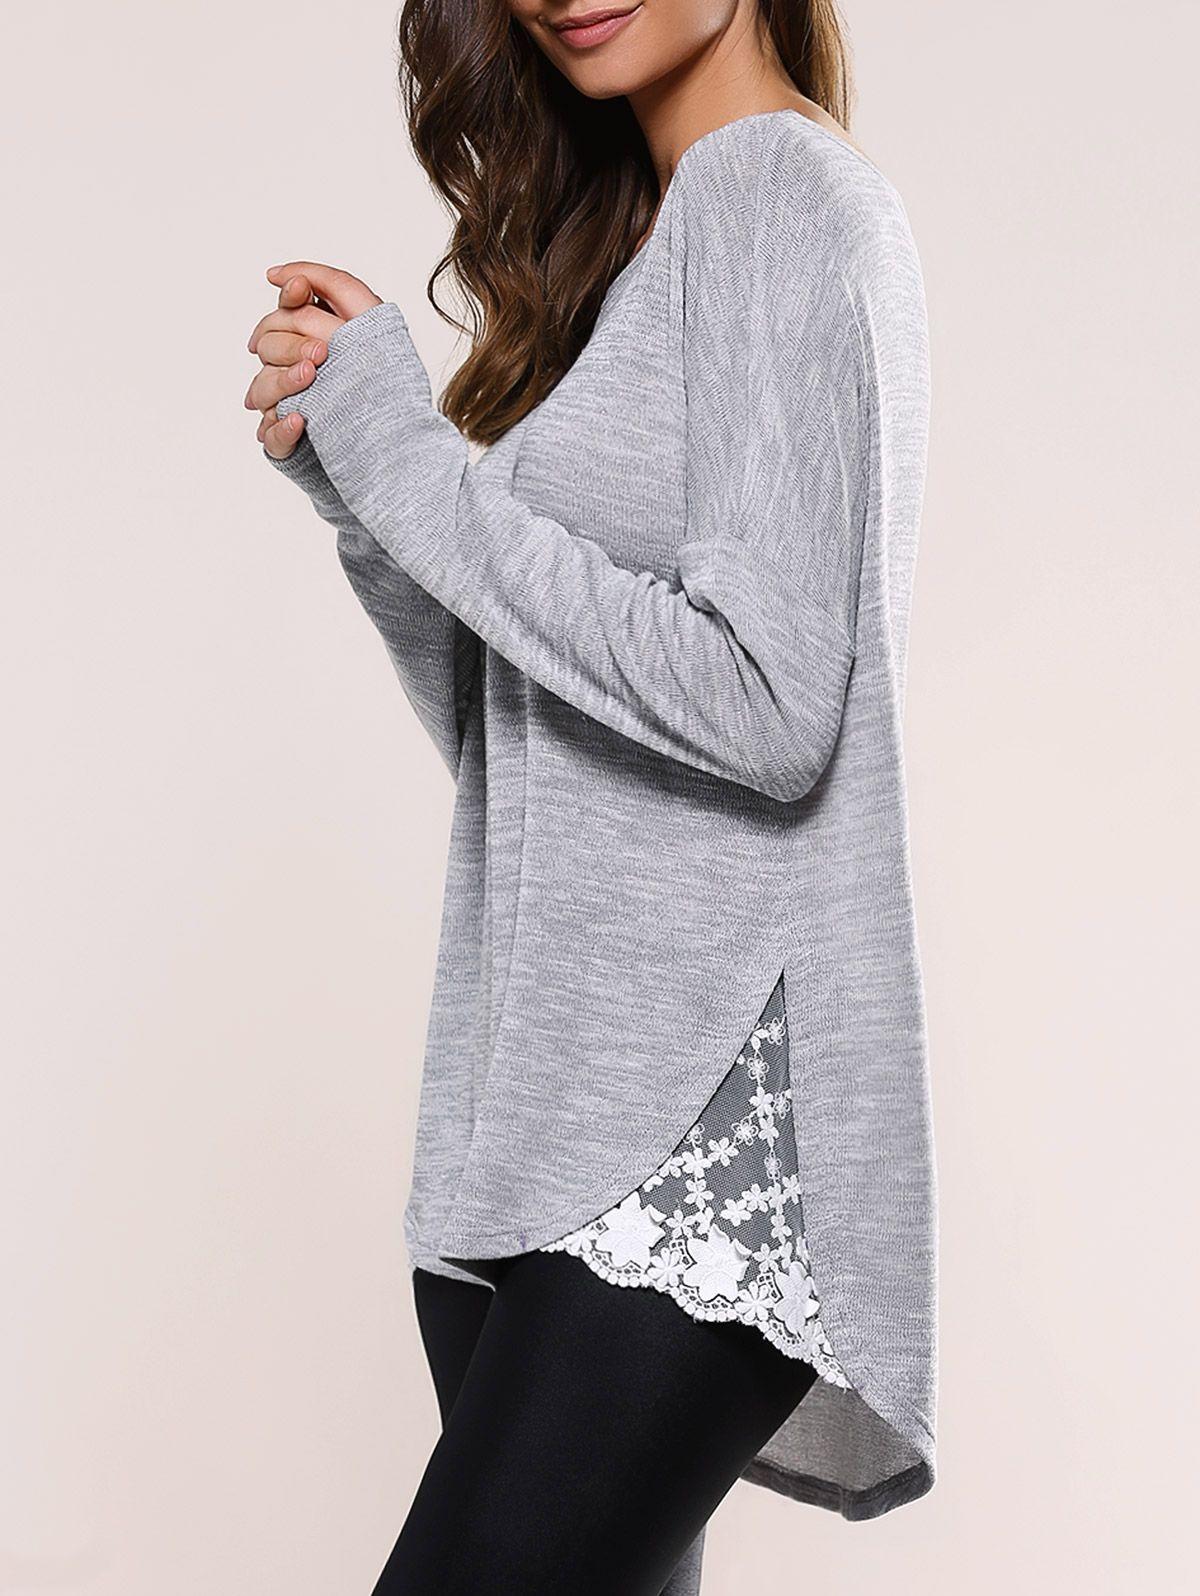 Leather Accent Tag - violet sweater by VIDA VIDA NEylaRmc